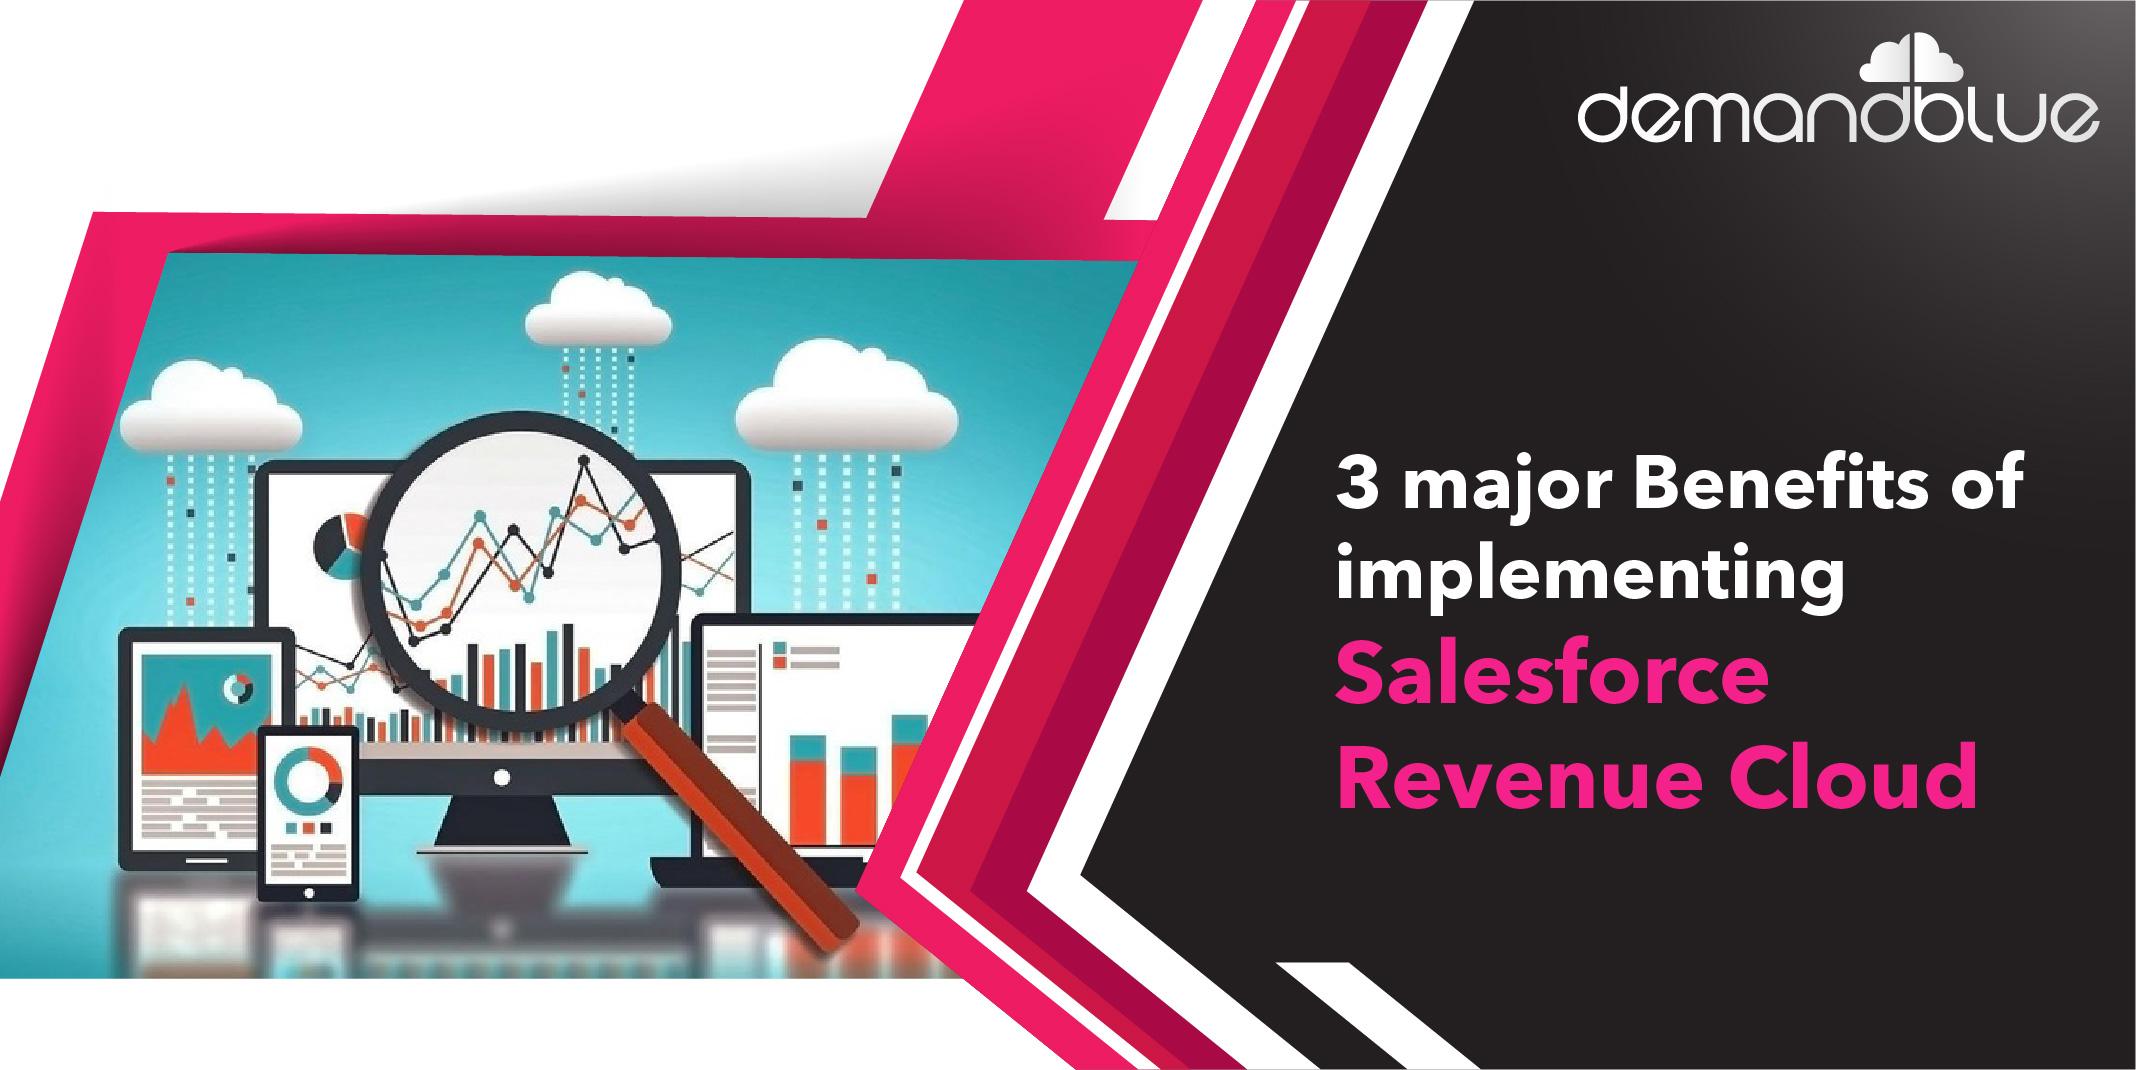 3 major benefits of implementing Salesforce Revenue Cloud